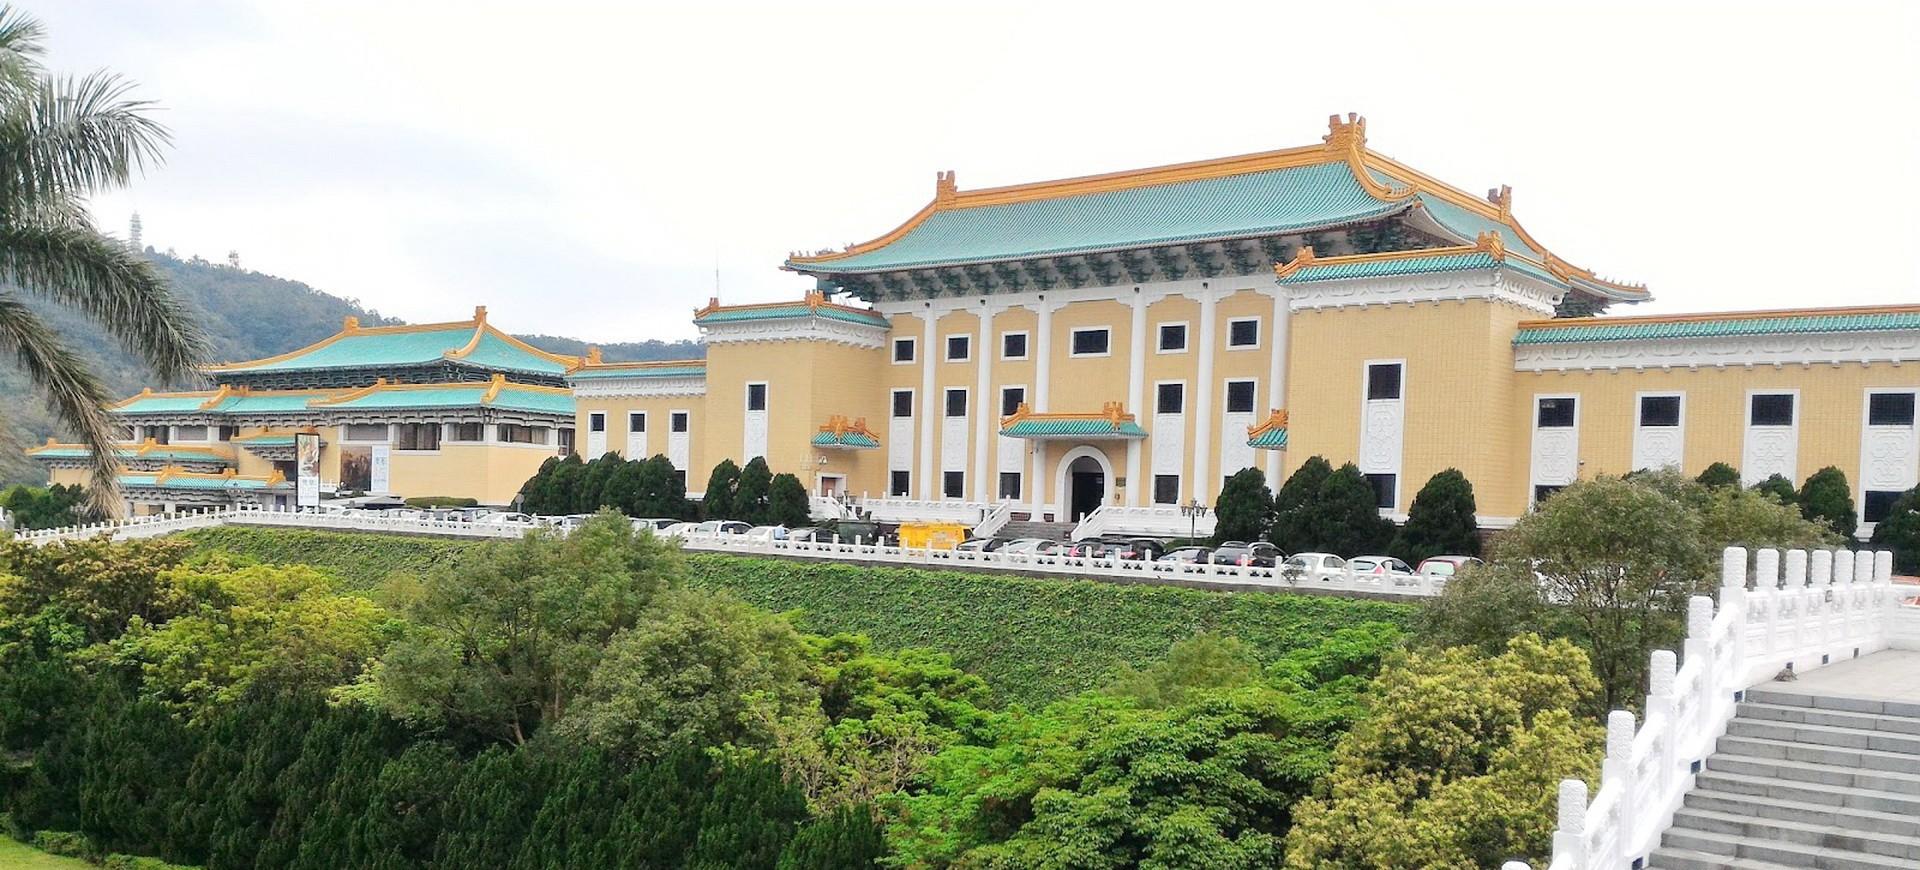 Taiwan Taipei Musée National du Palais